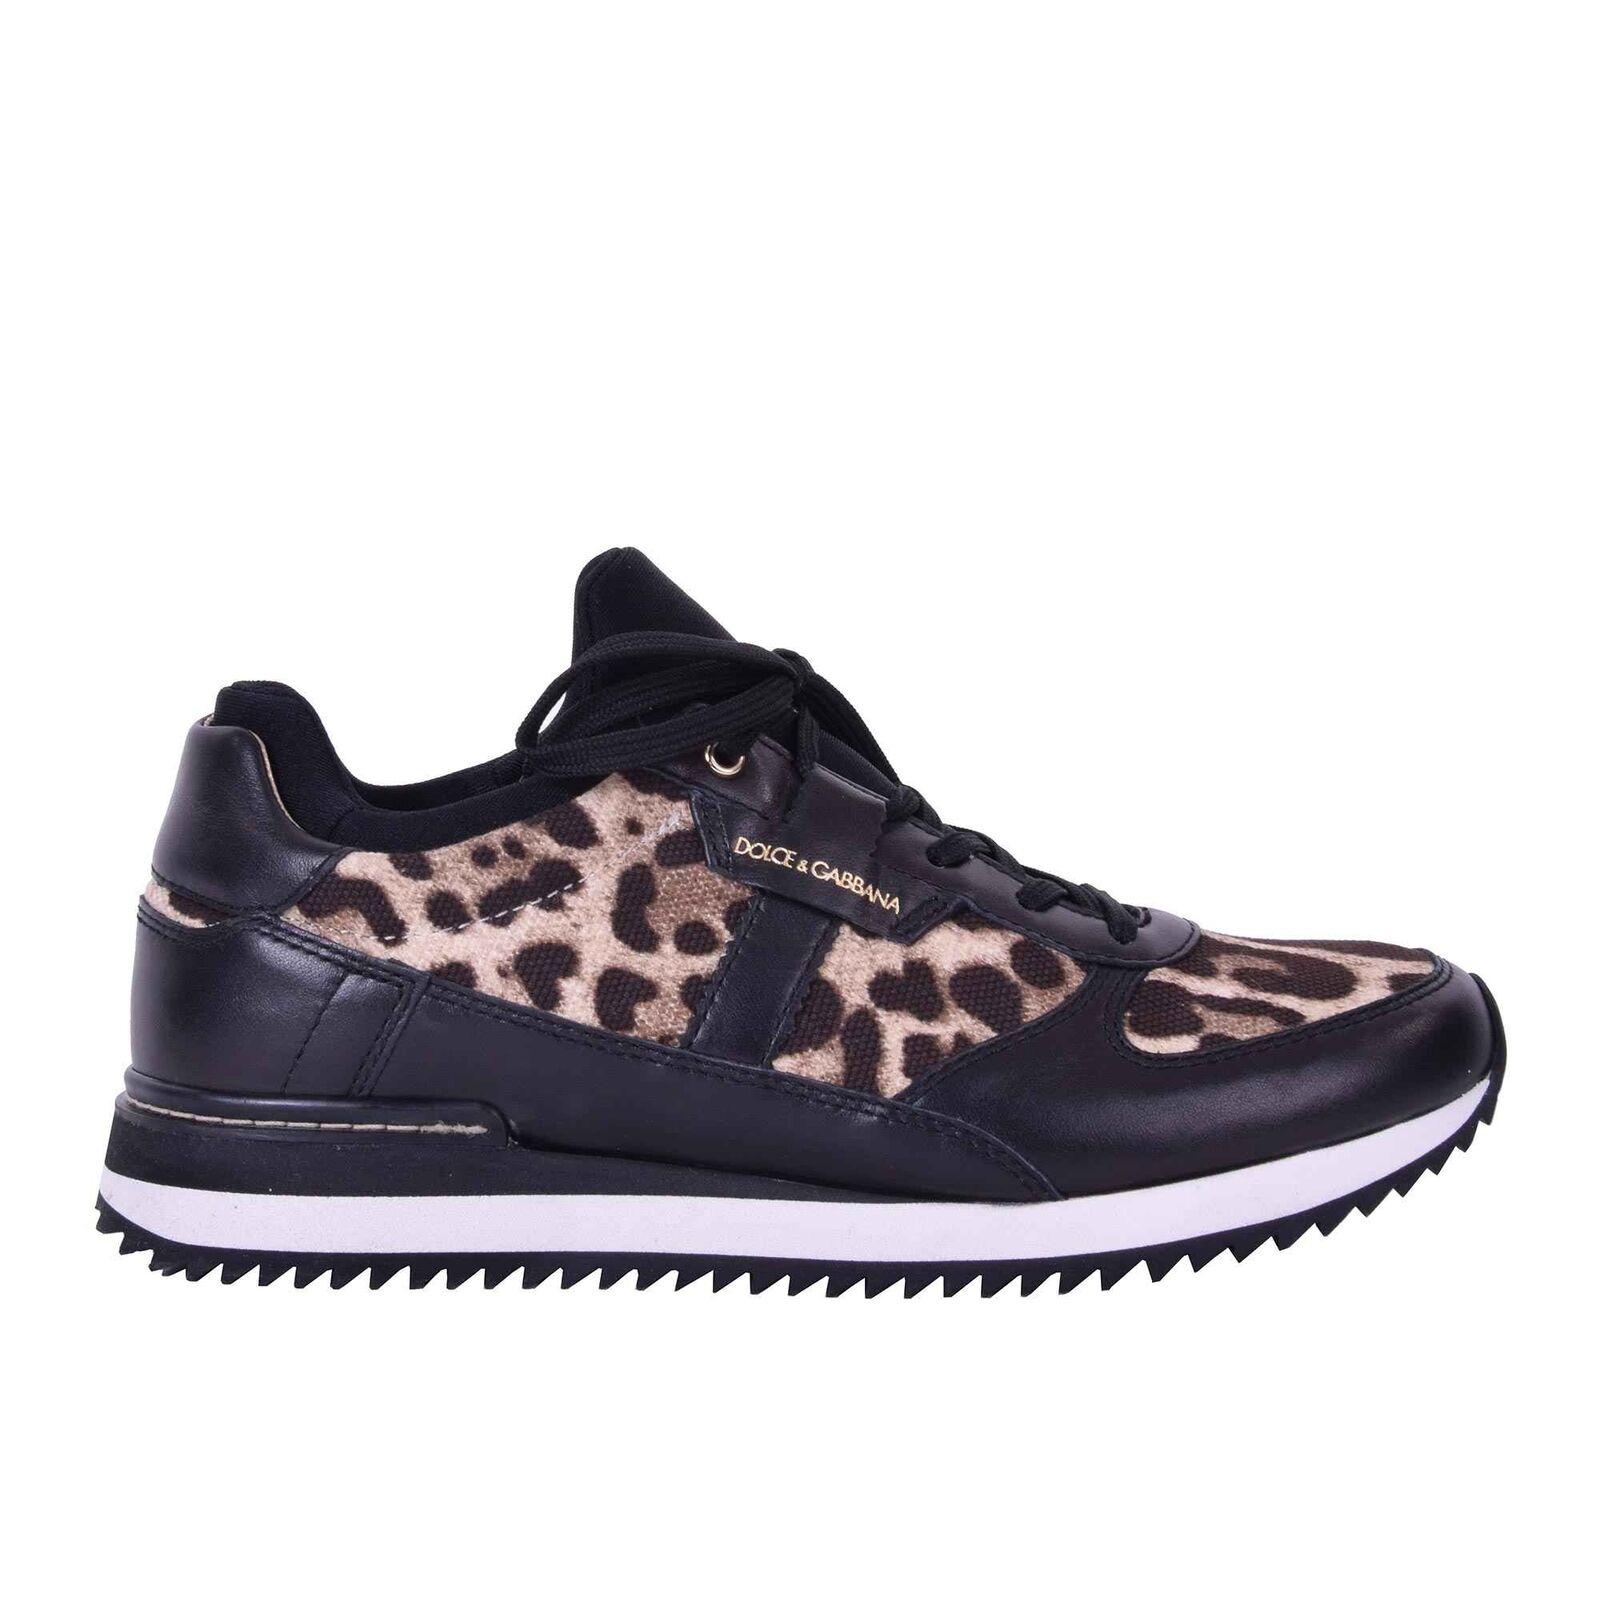 Dolce & Nigeria GABBANA Sneakers Donna Scarpe Sneaker Nigeria & Leopard Nero 05921 606aab